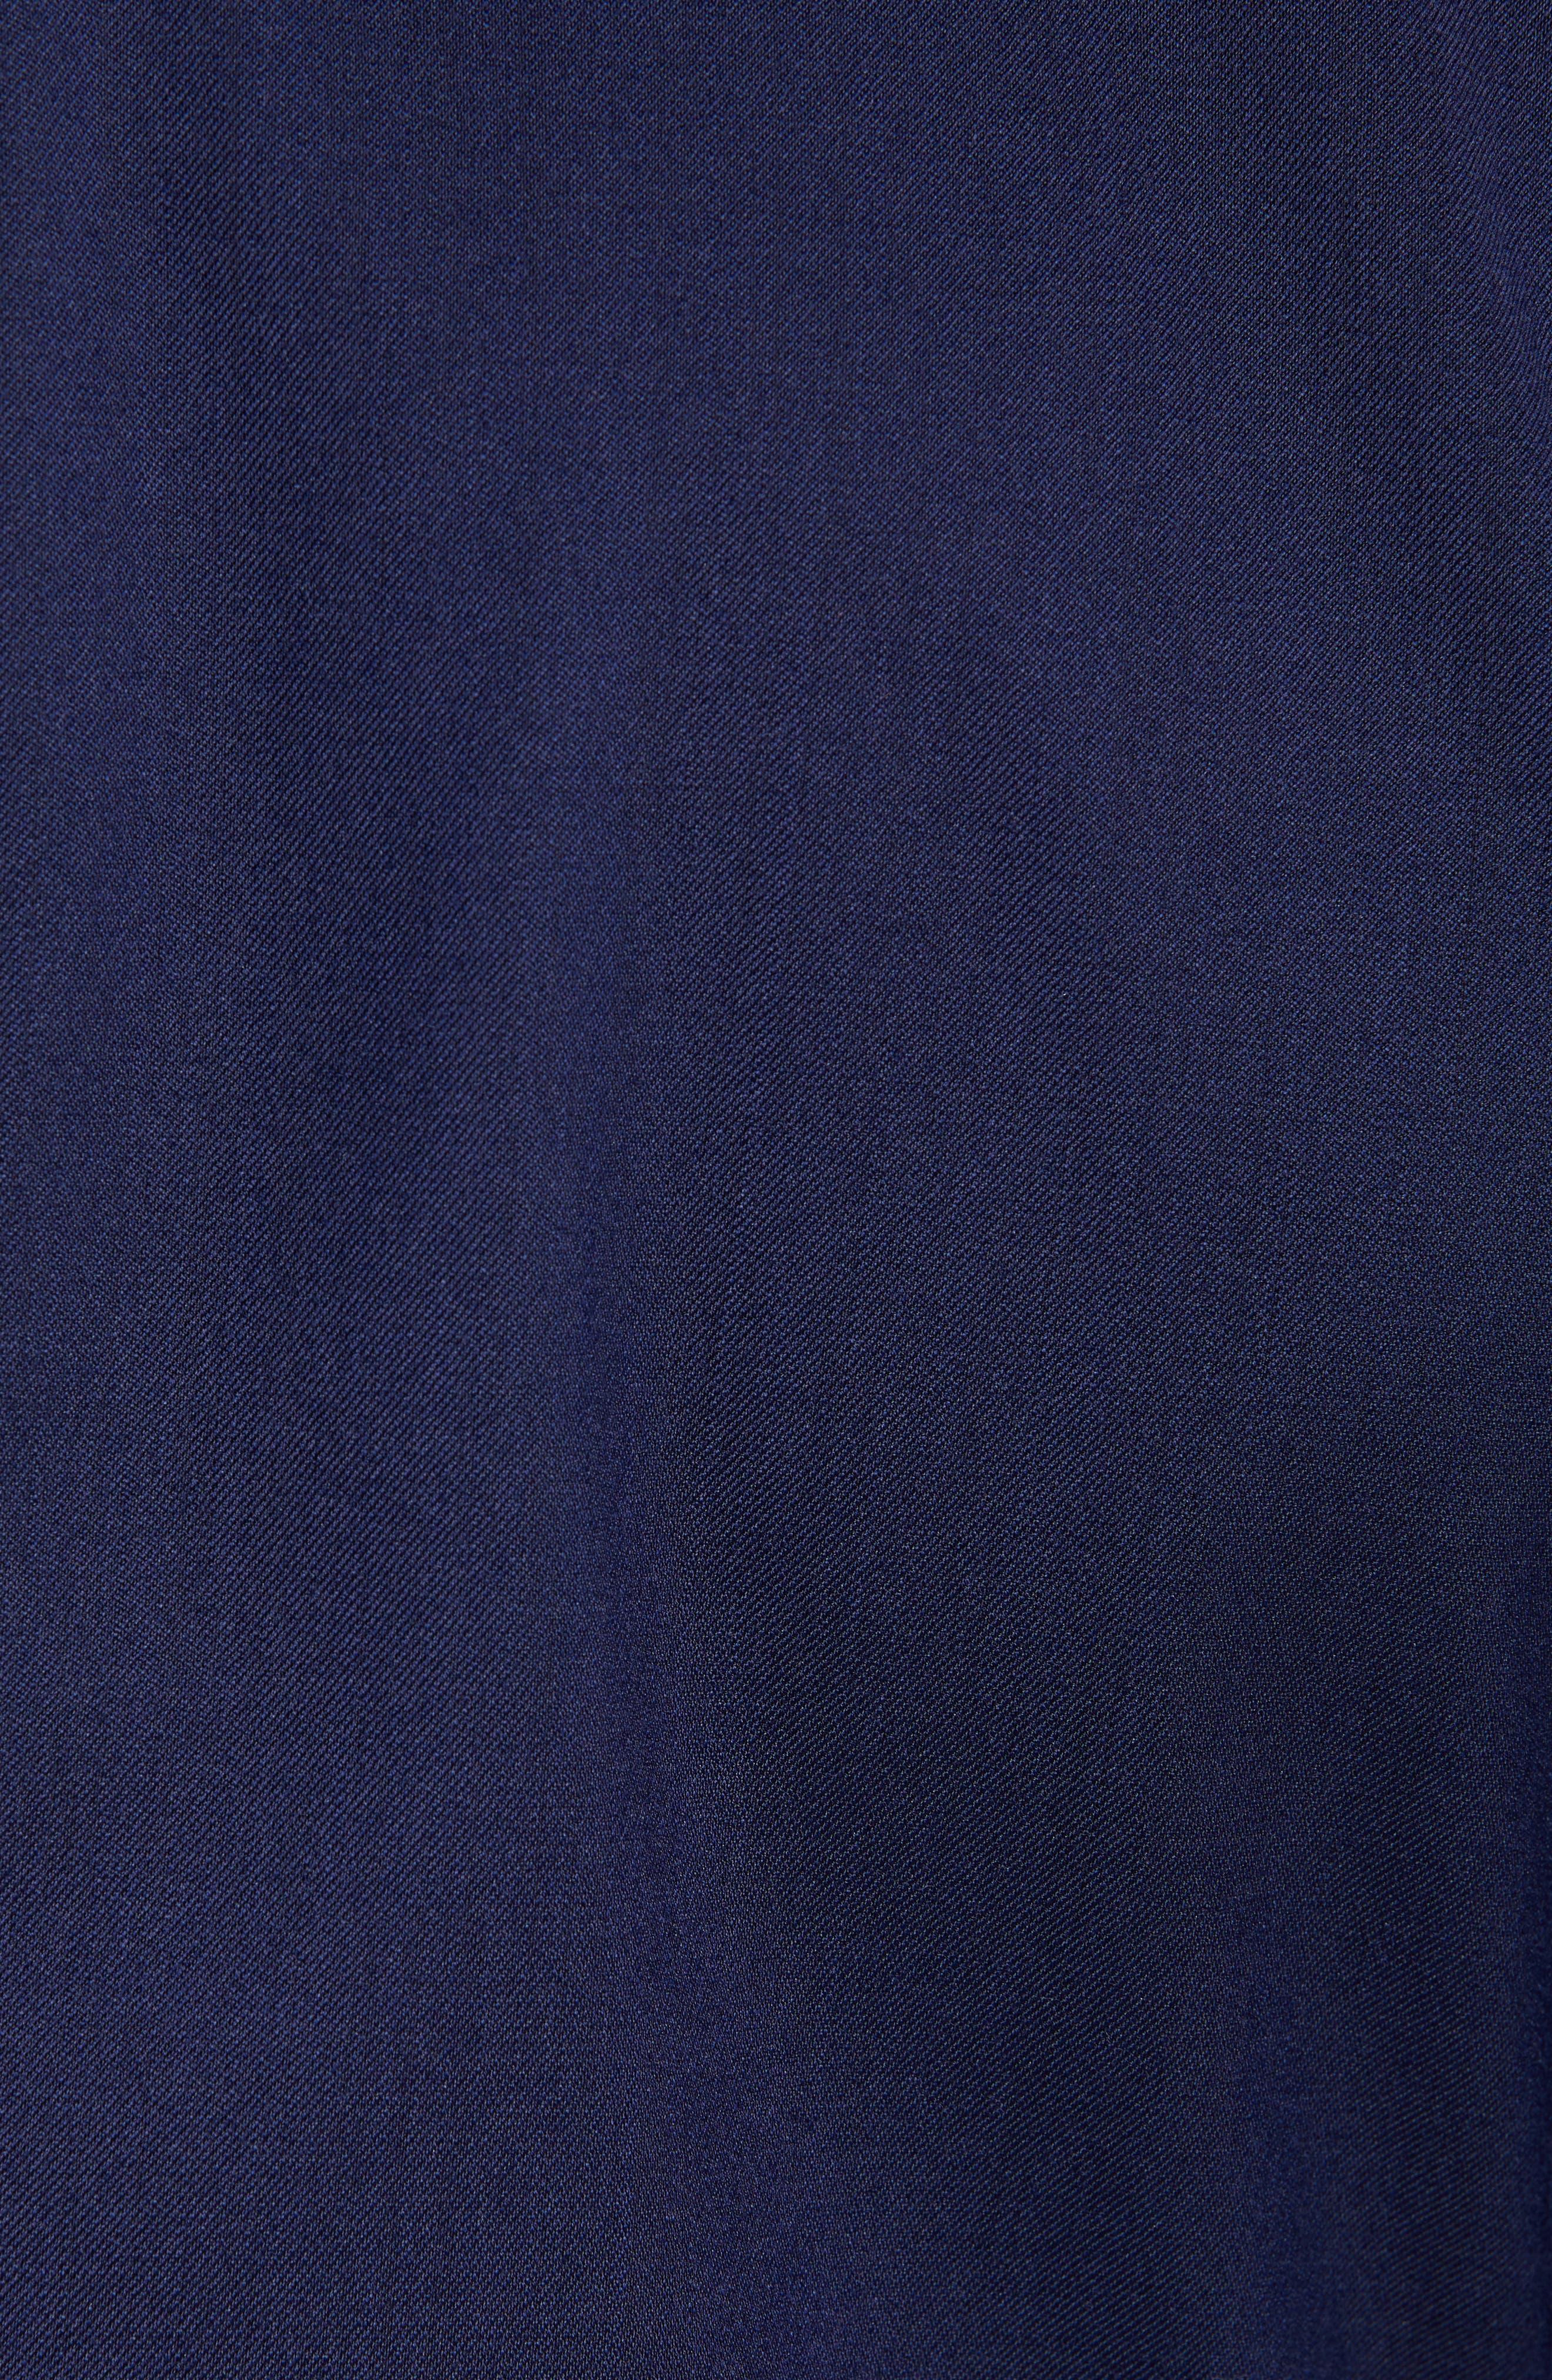 Capstone Slim Fit Italian Wool Blend Dinner Jacket,                             Alternate thumbnail 6, color,                             NAVY